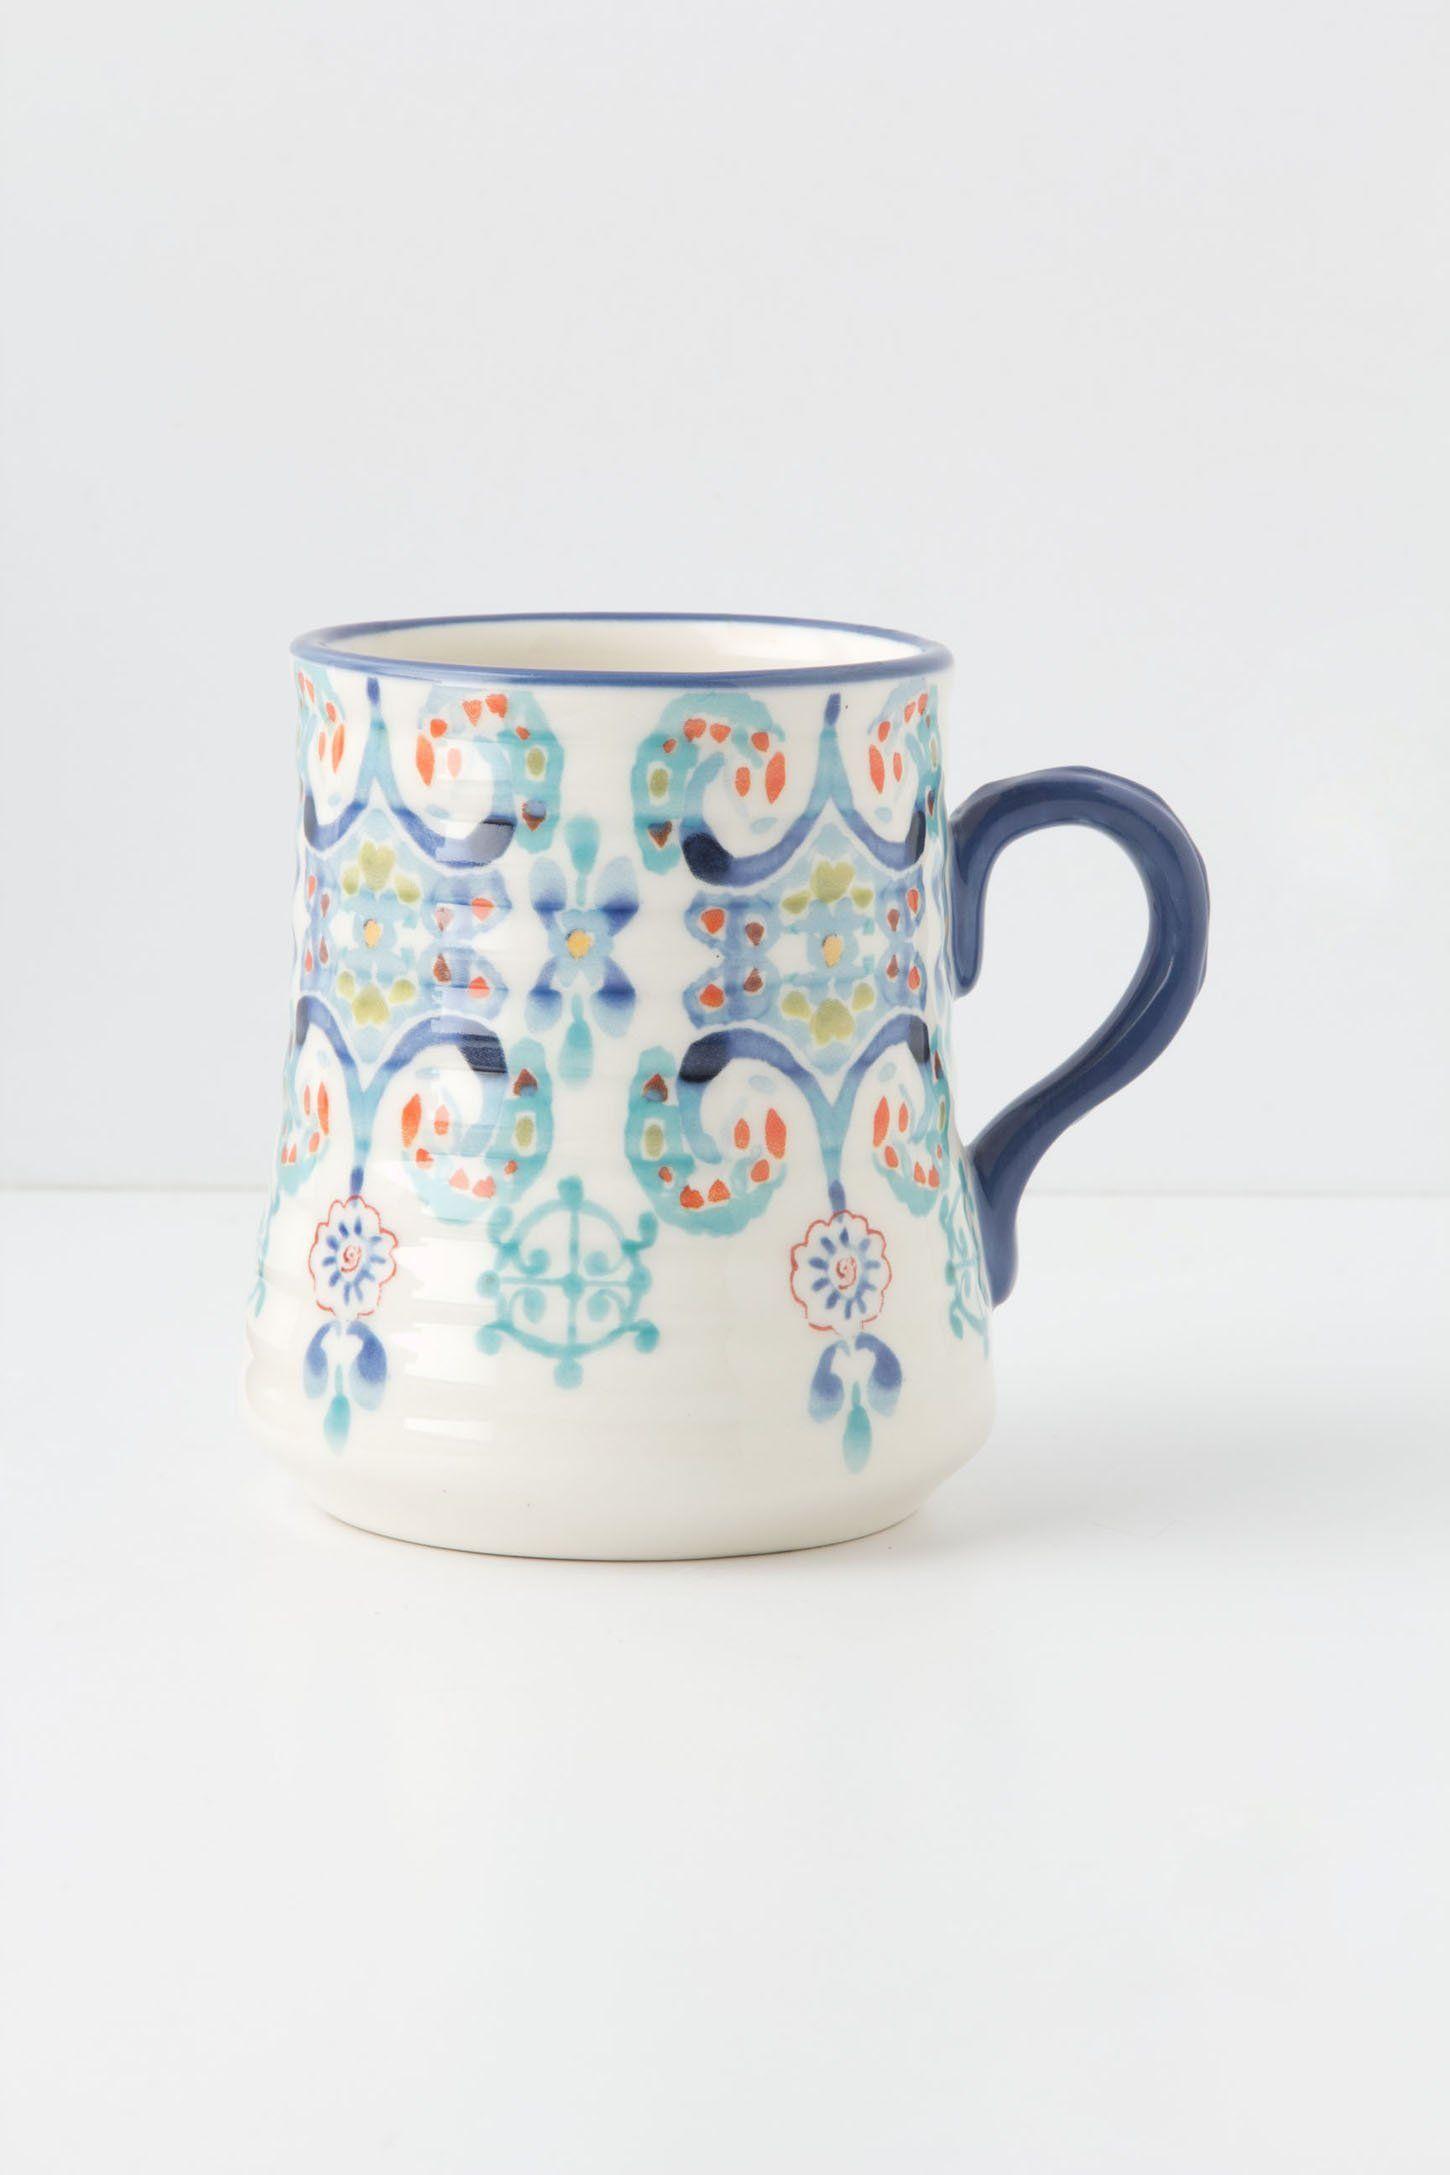 Swirled Symmetry Mug Anthropologie mugs, Cute coffee